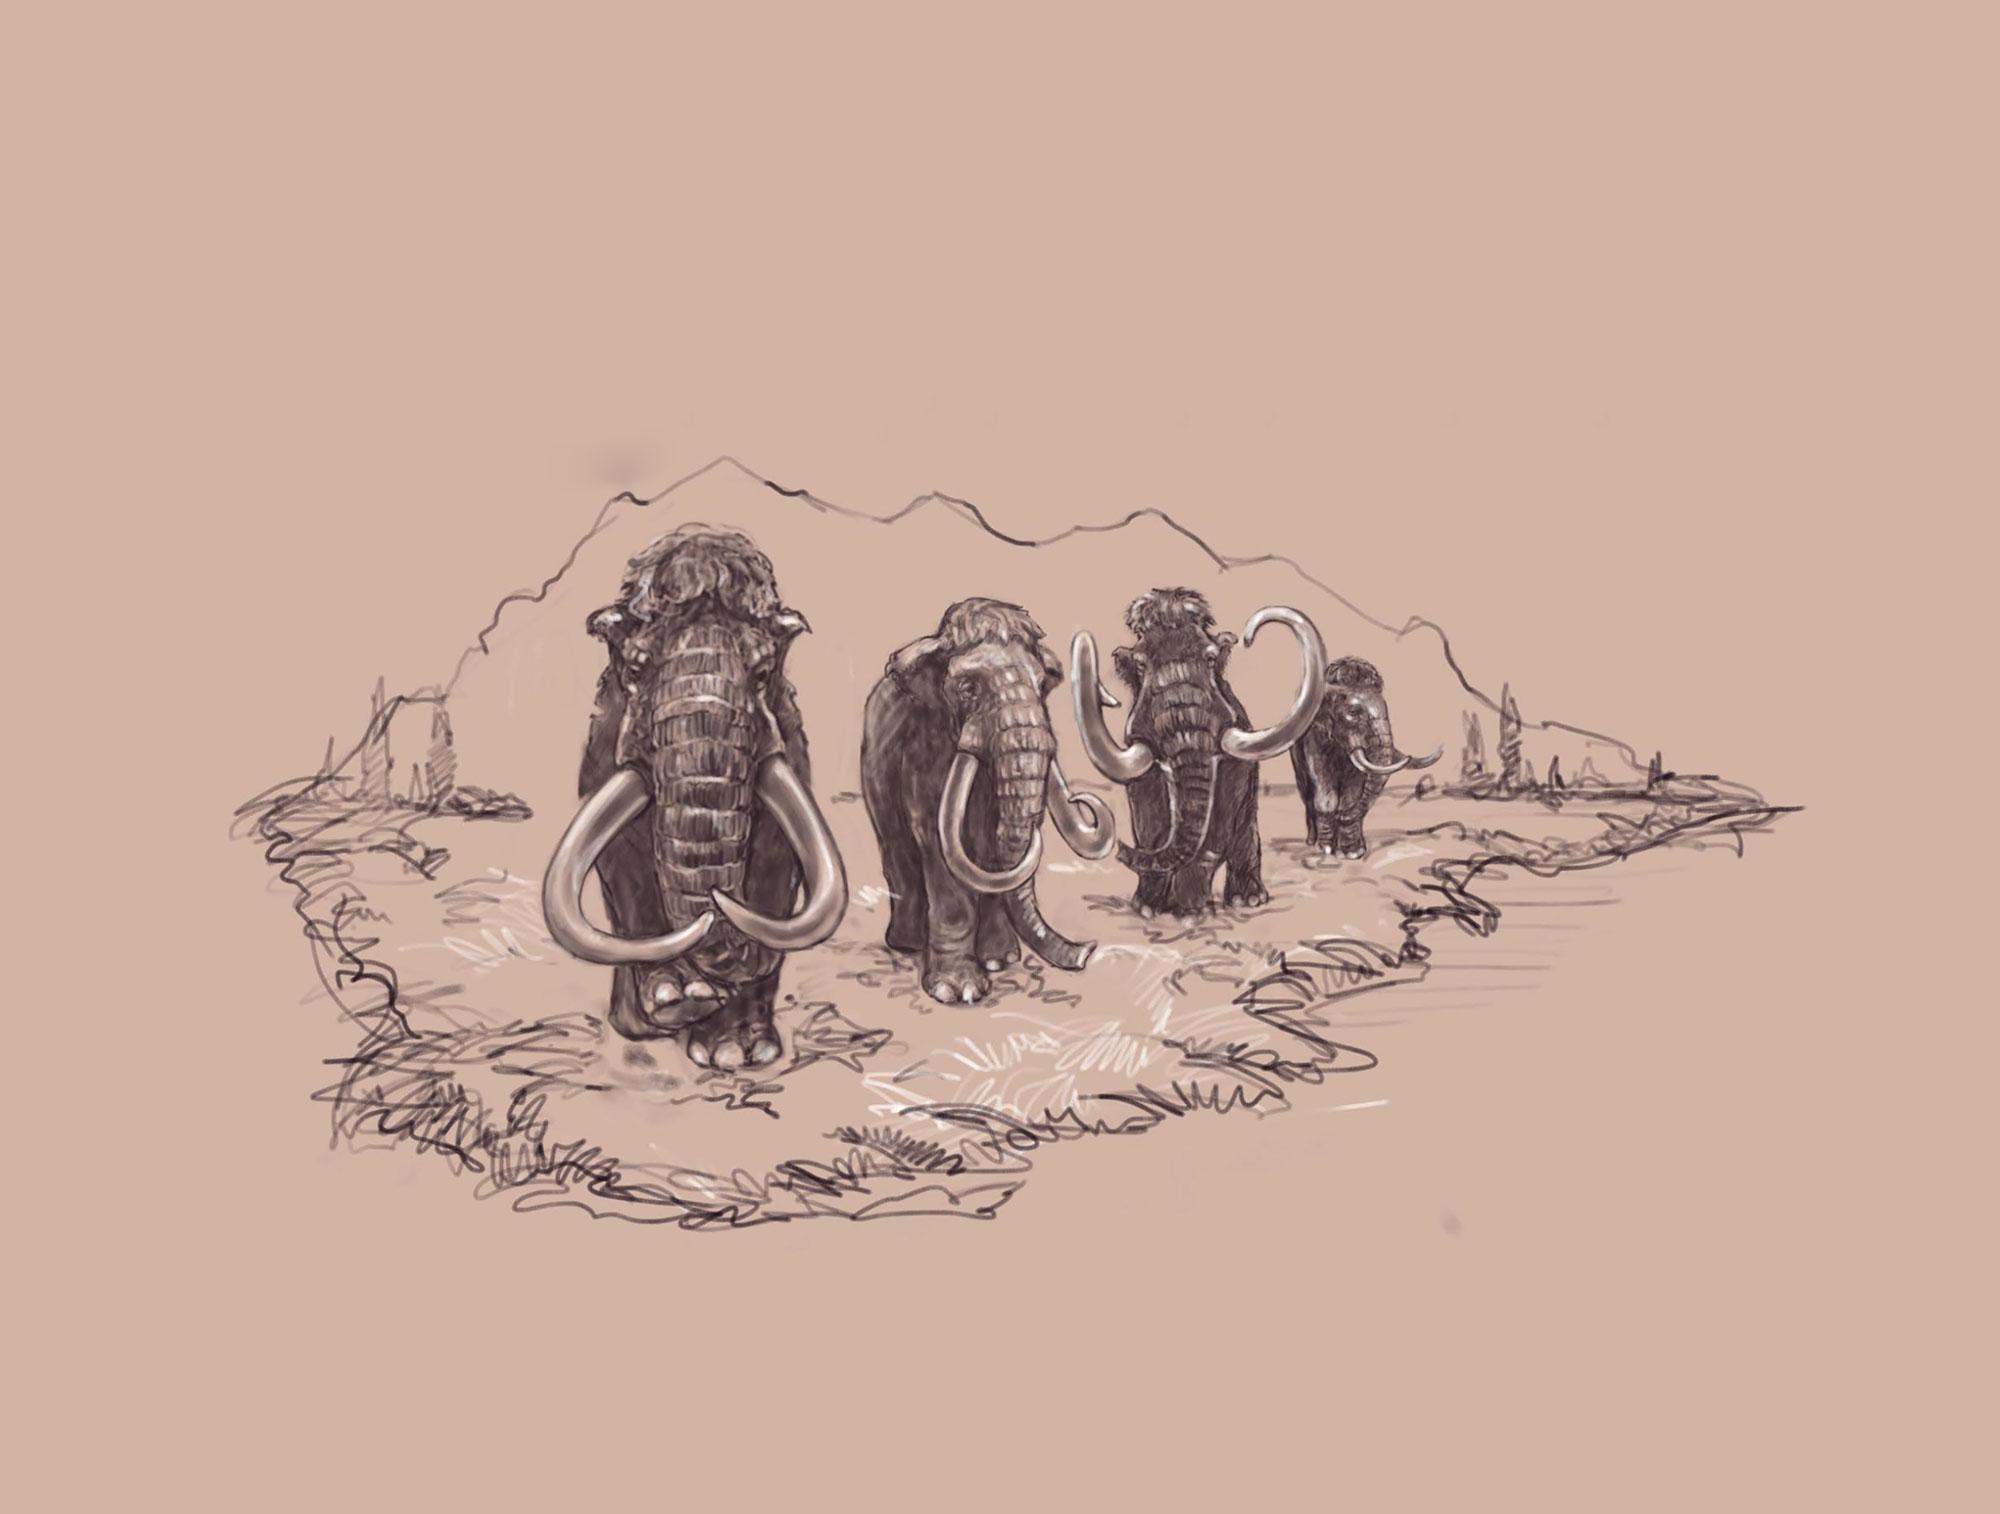 Woolly-Mammoth-Landscape_Sepia-Enlarged-2_resized.jpg